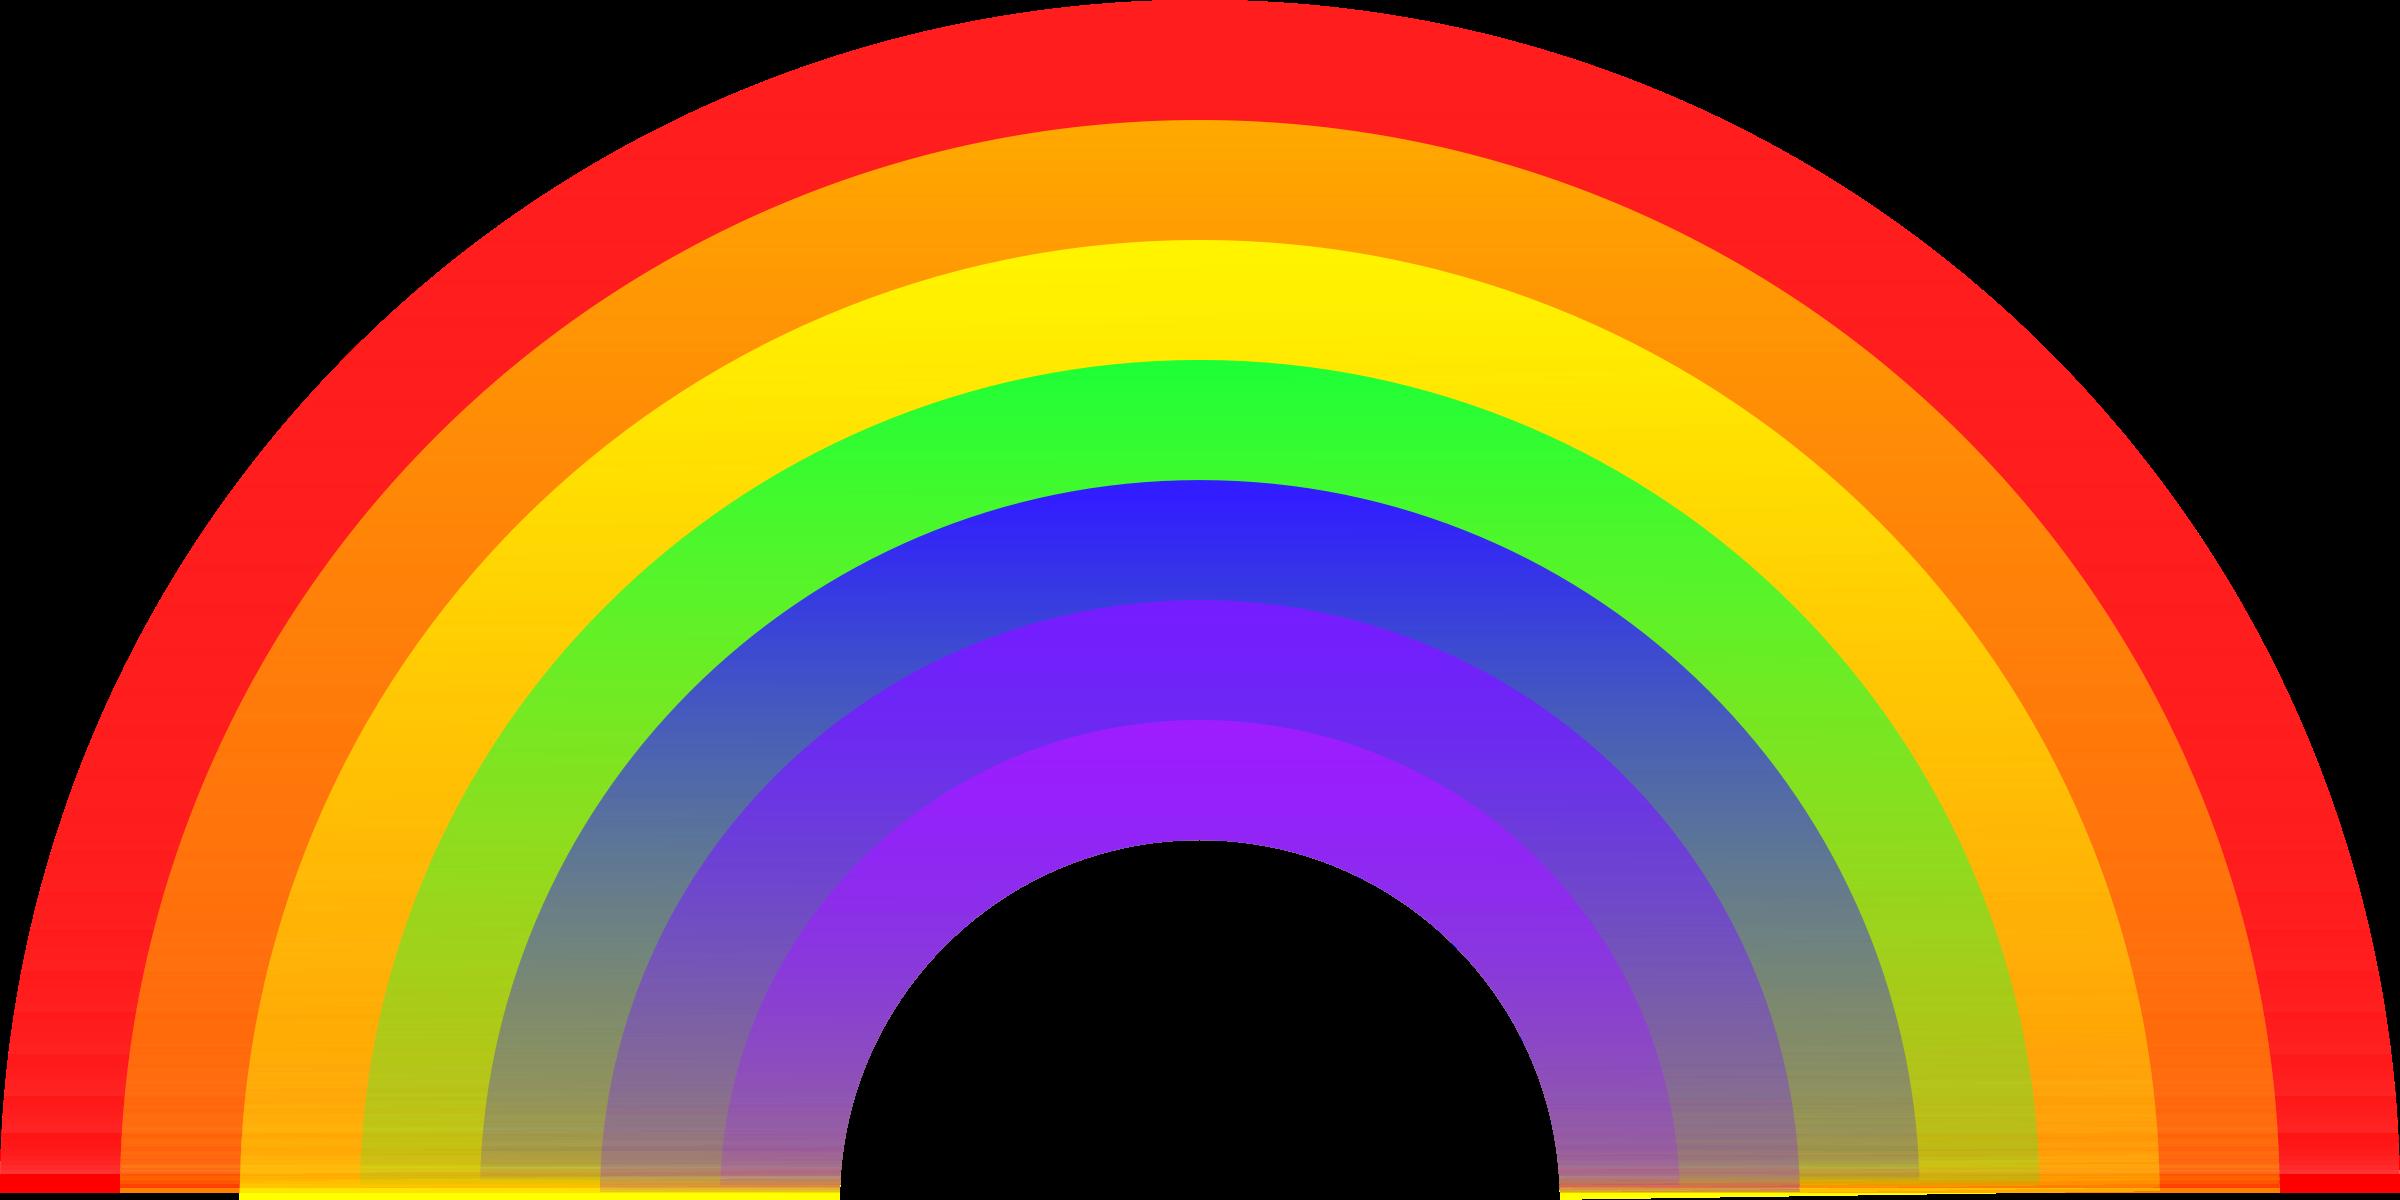 Rainbow Png Image Rainbow Clipart Rainbow Png Rainbow Images